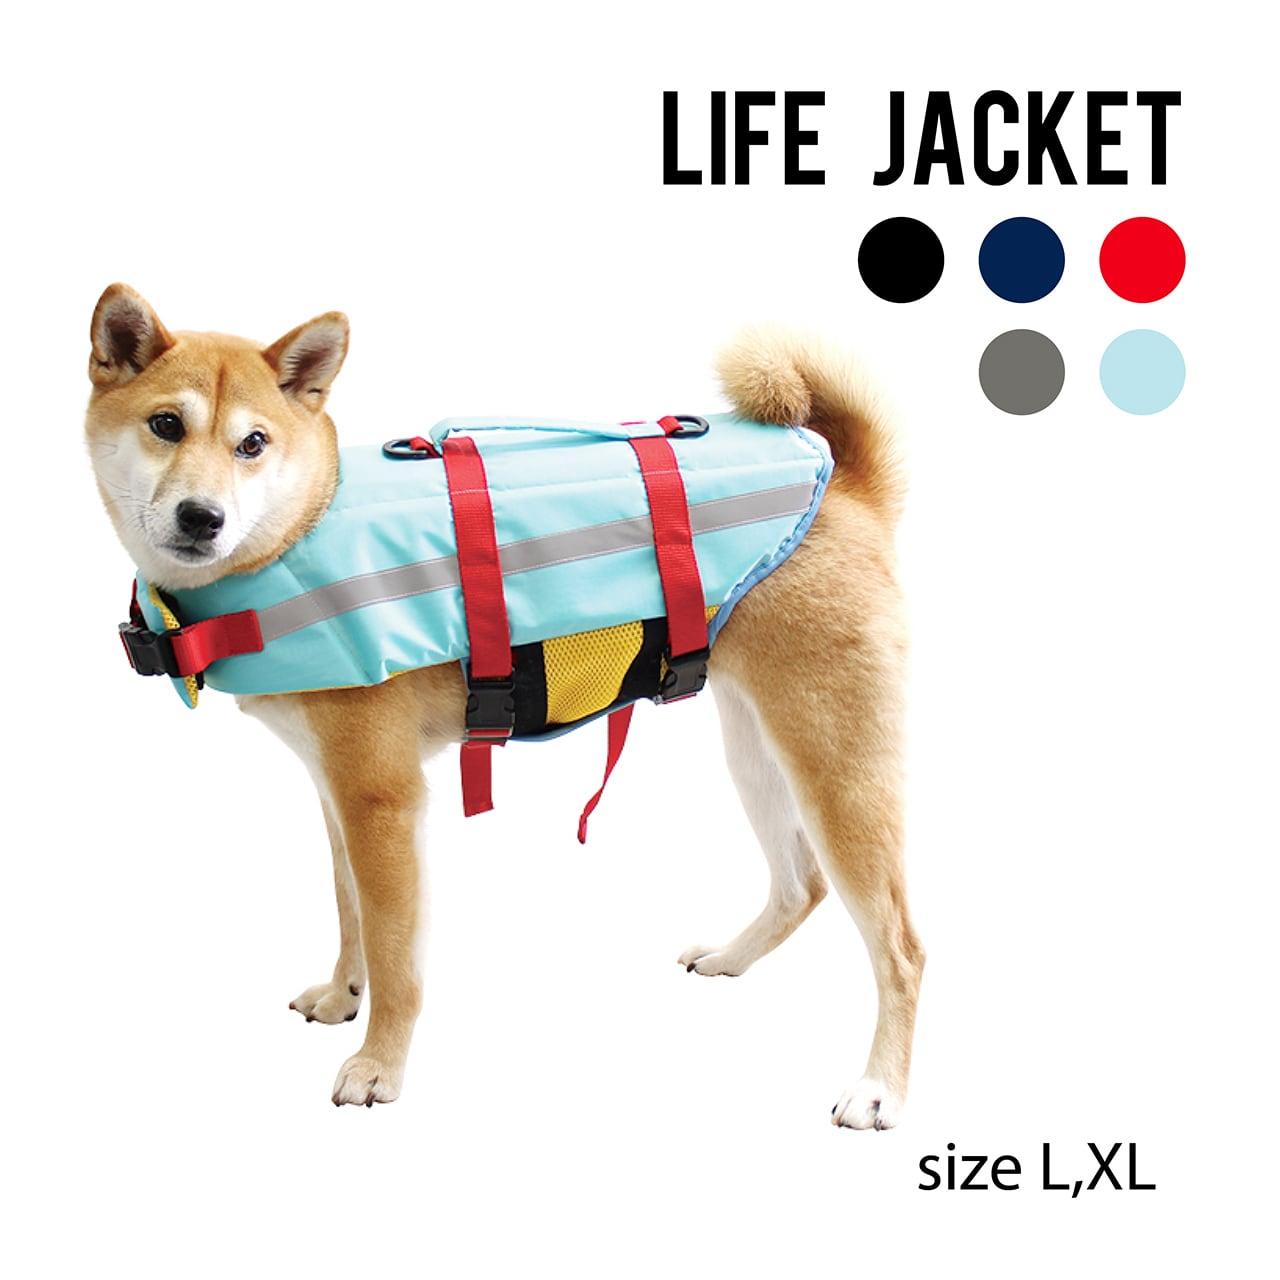 LIFE JACKET(L,XL) ライフジャケット